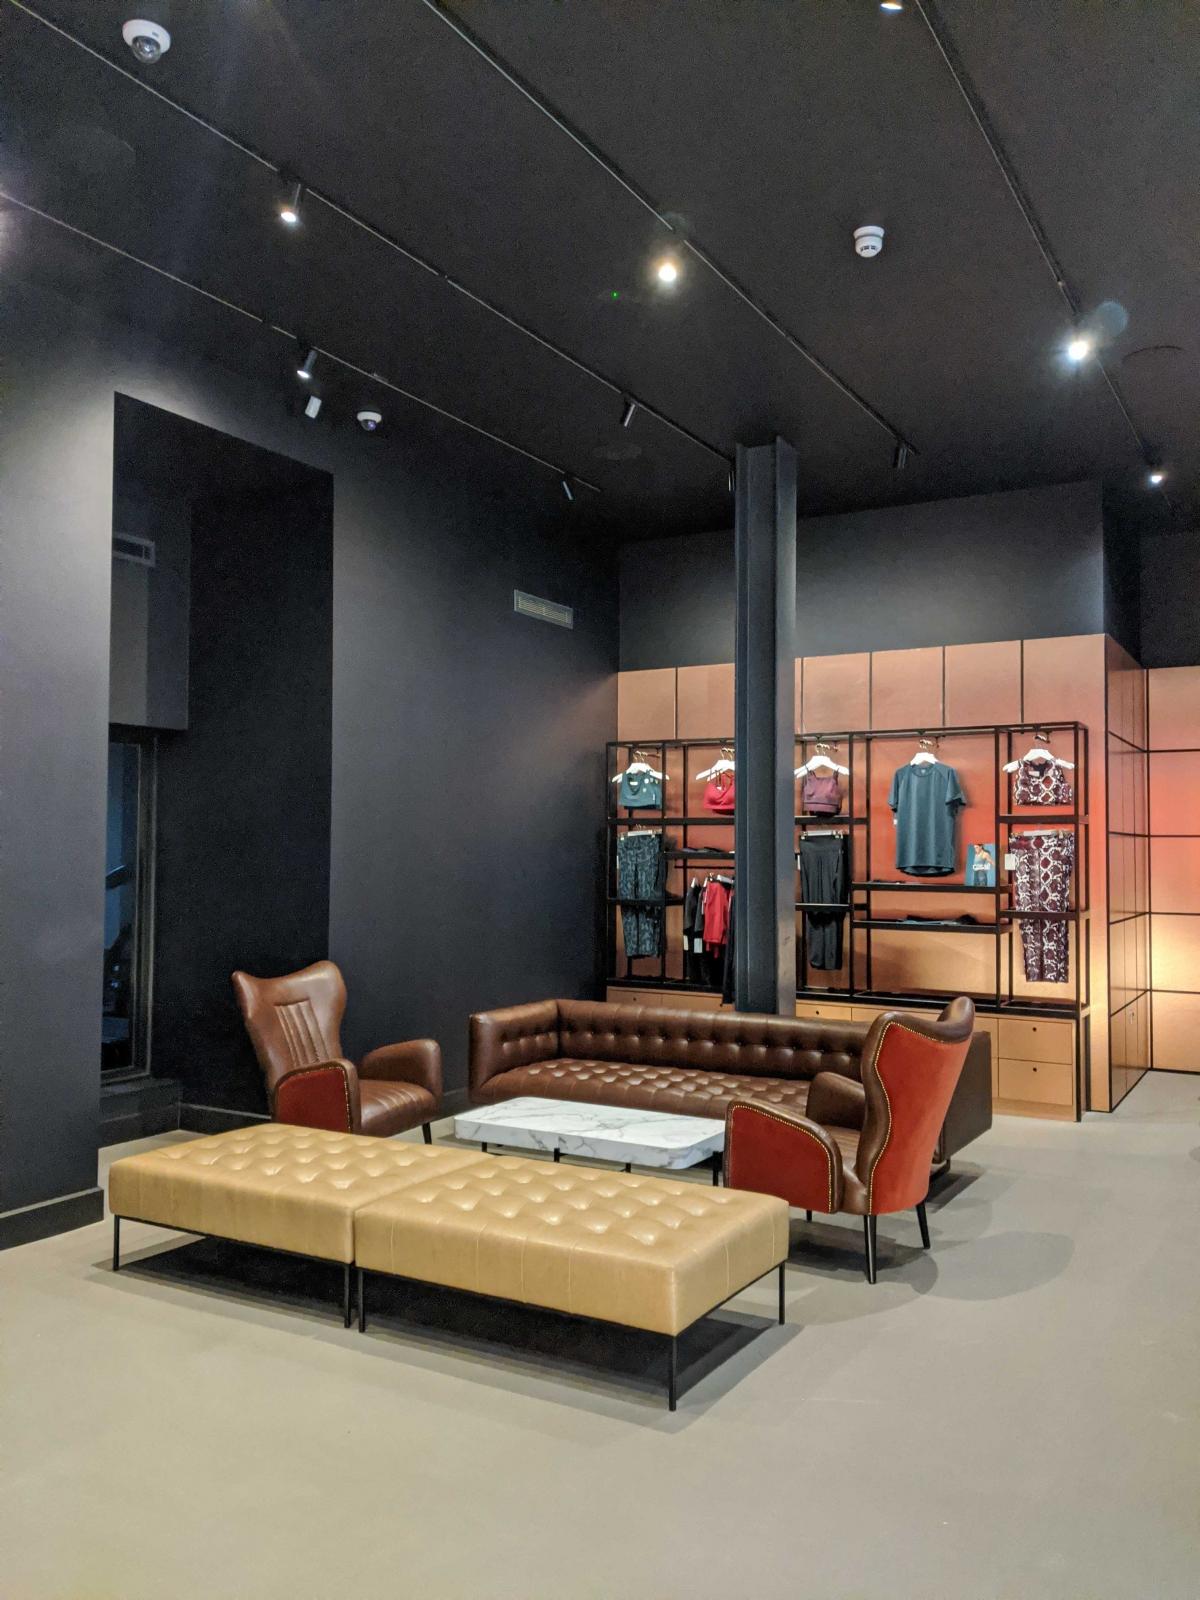 Blaze Studio Birmingham lounge area with sports clothing shopping area